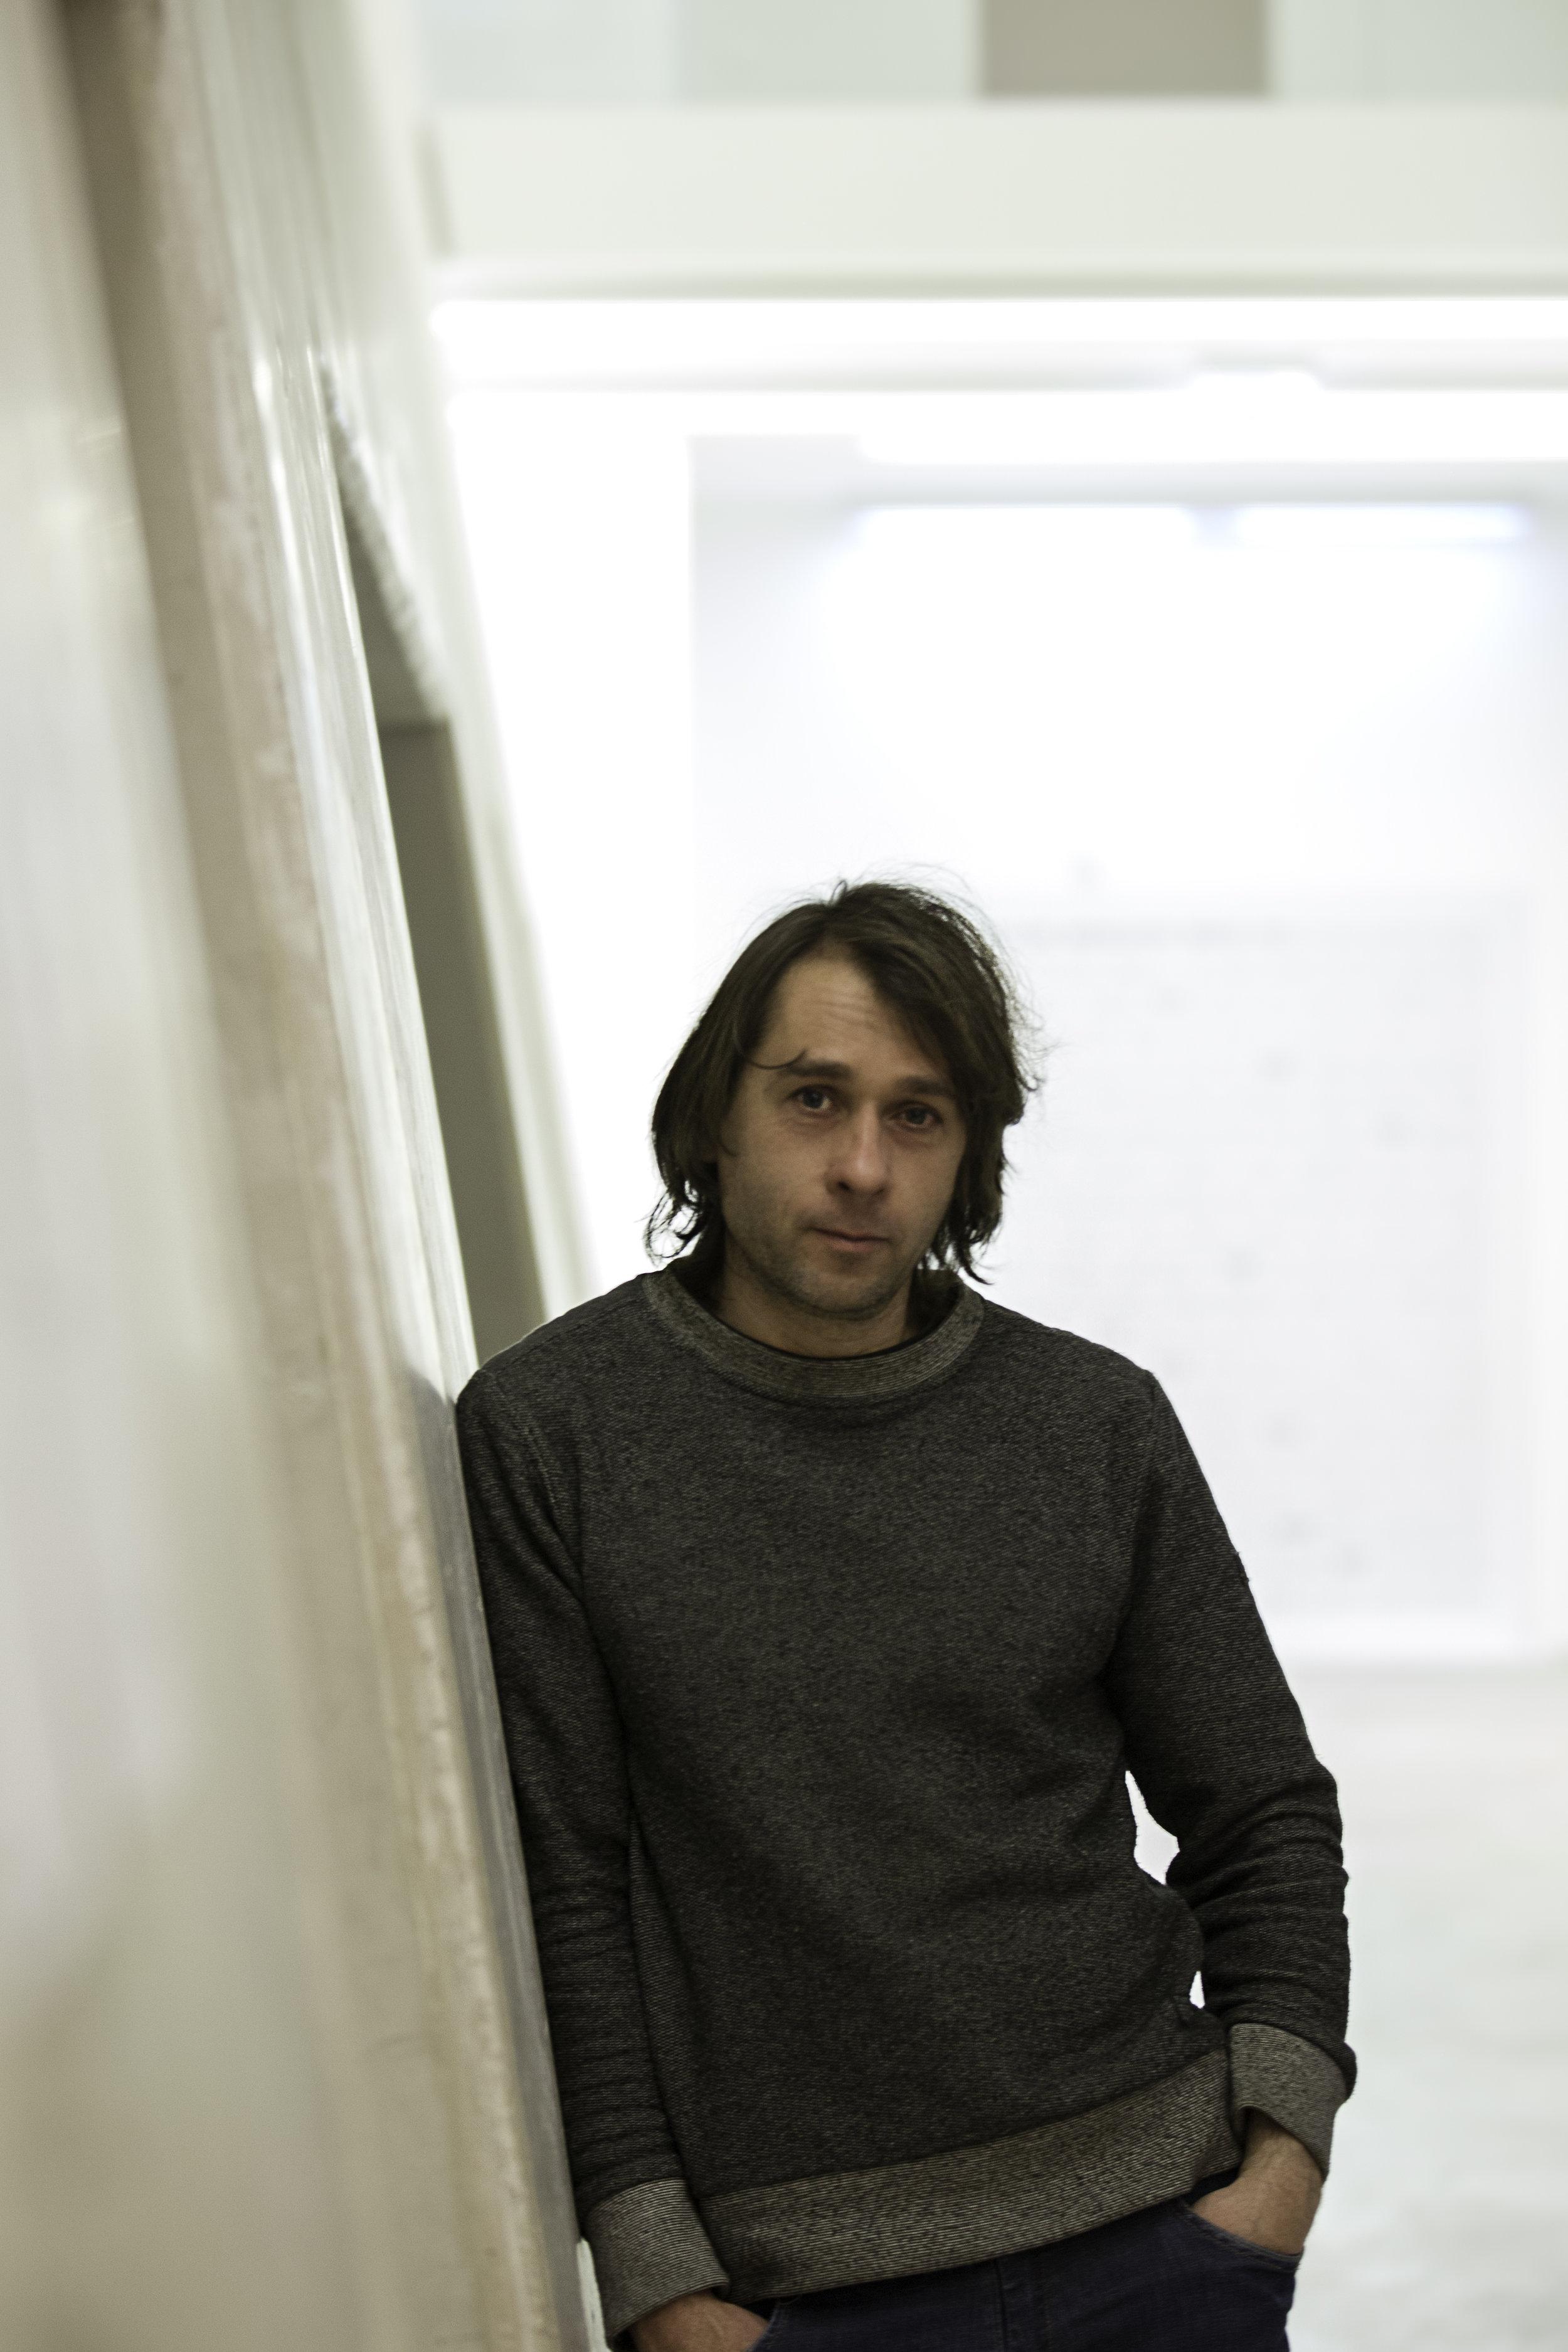 Matej Grilc